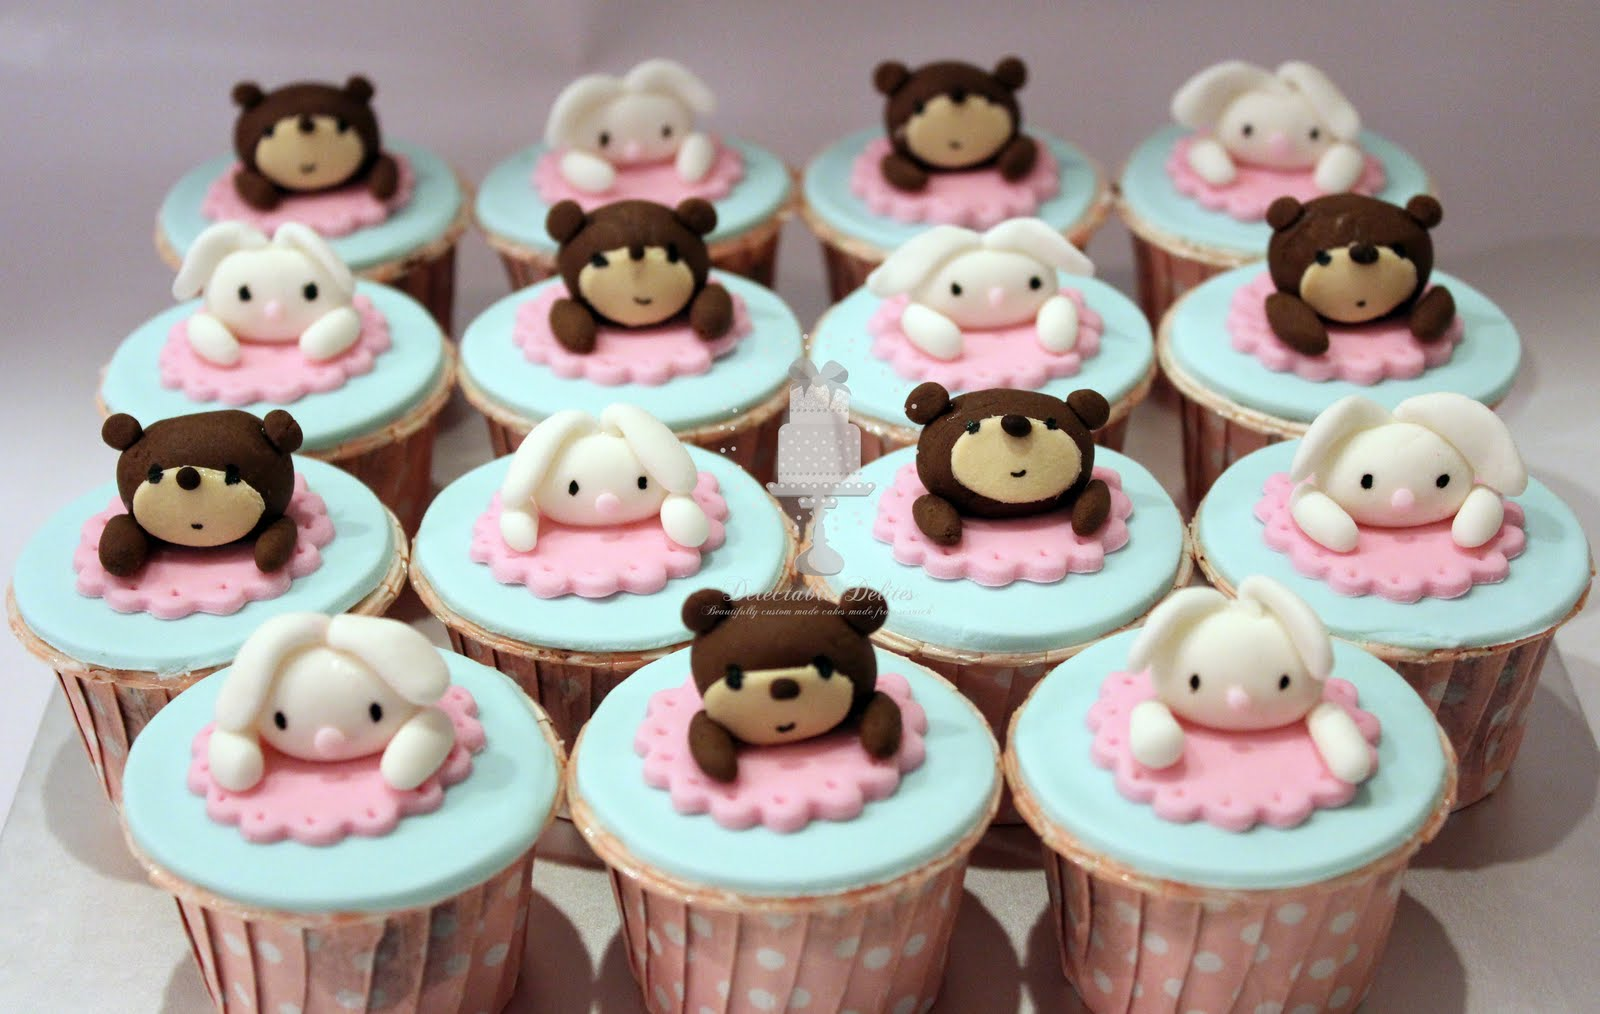 Delectable delites bunnies teddies cake cupcakes for - Jolie cupcake ...